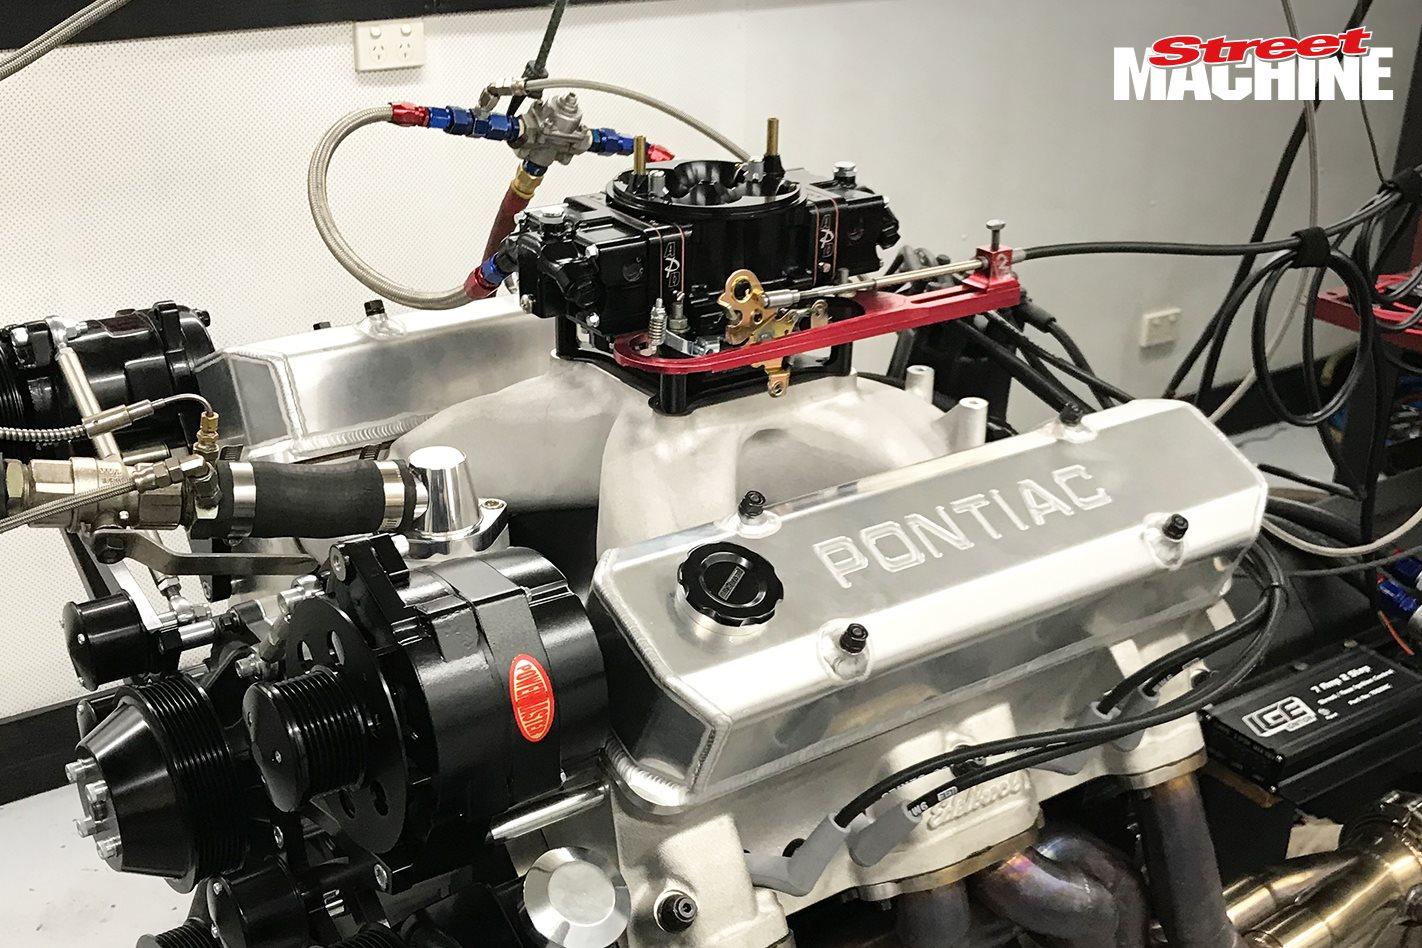 535ci Pontiac on the engine dyno – Video